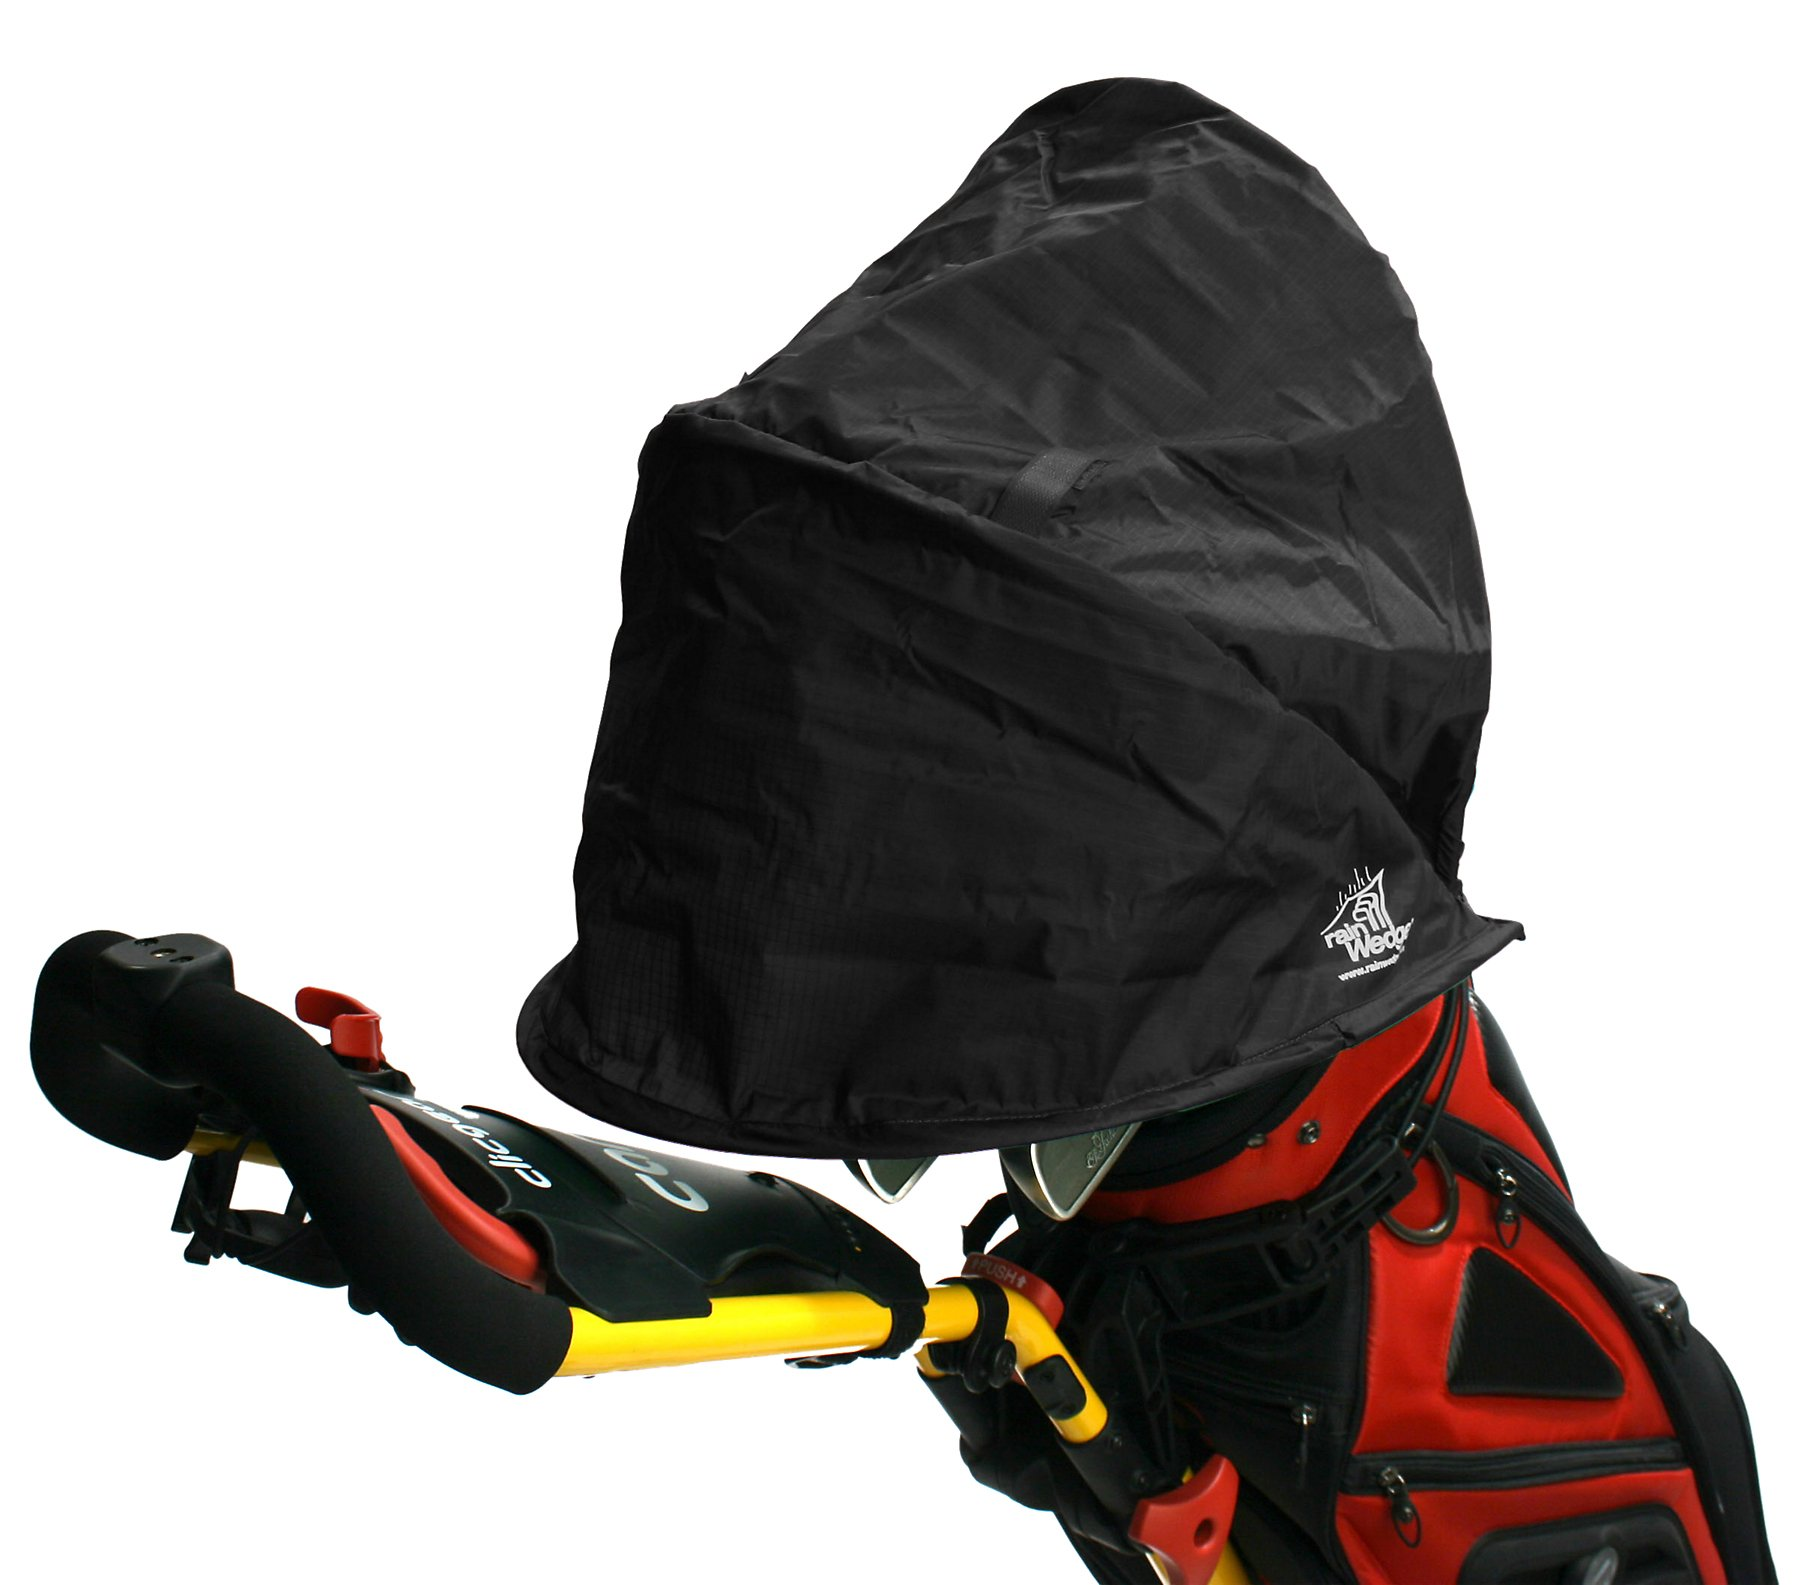 ProActive Sports Rain Wedge Easy Access Golf Bag Rain Hood/Cover by ProActive Sports (Image #2)